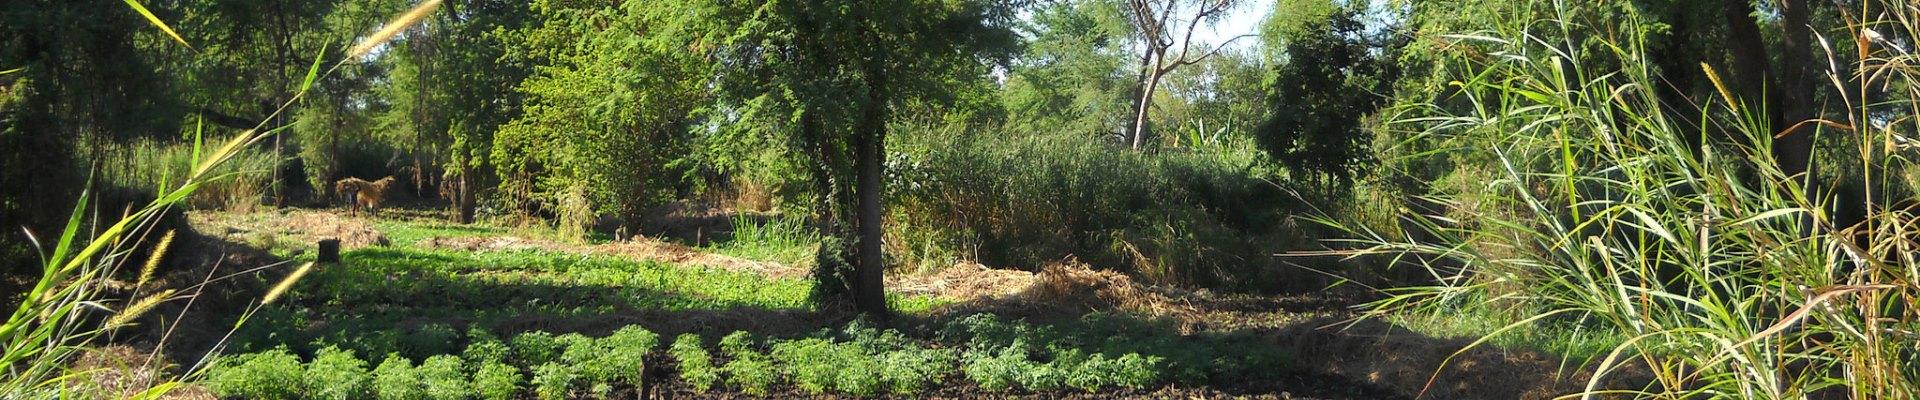 Provision of Adequate Tree Seed Portfolio in Ethiopia | World